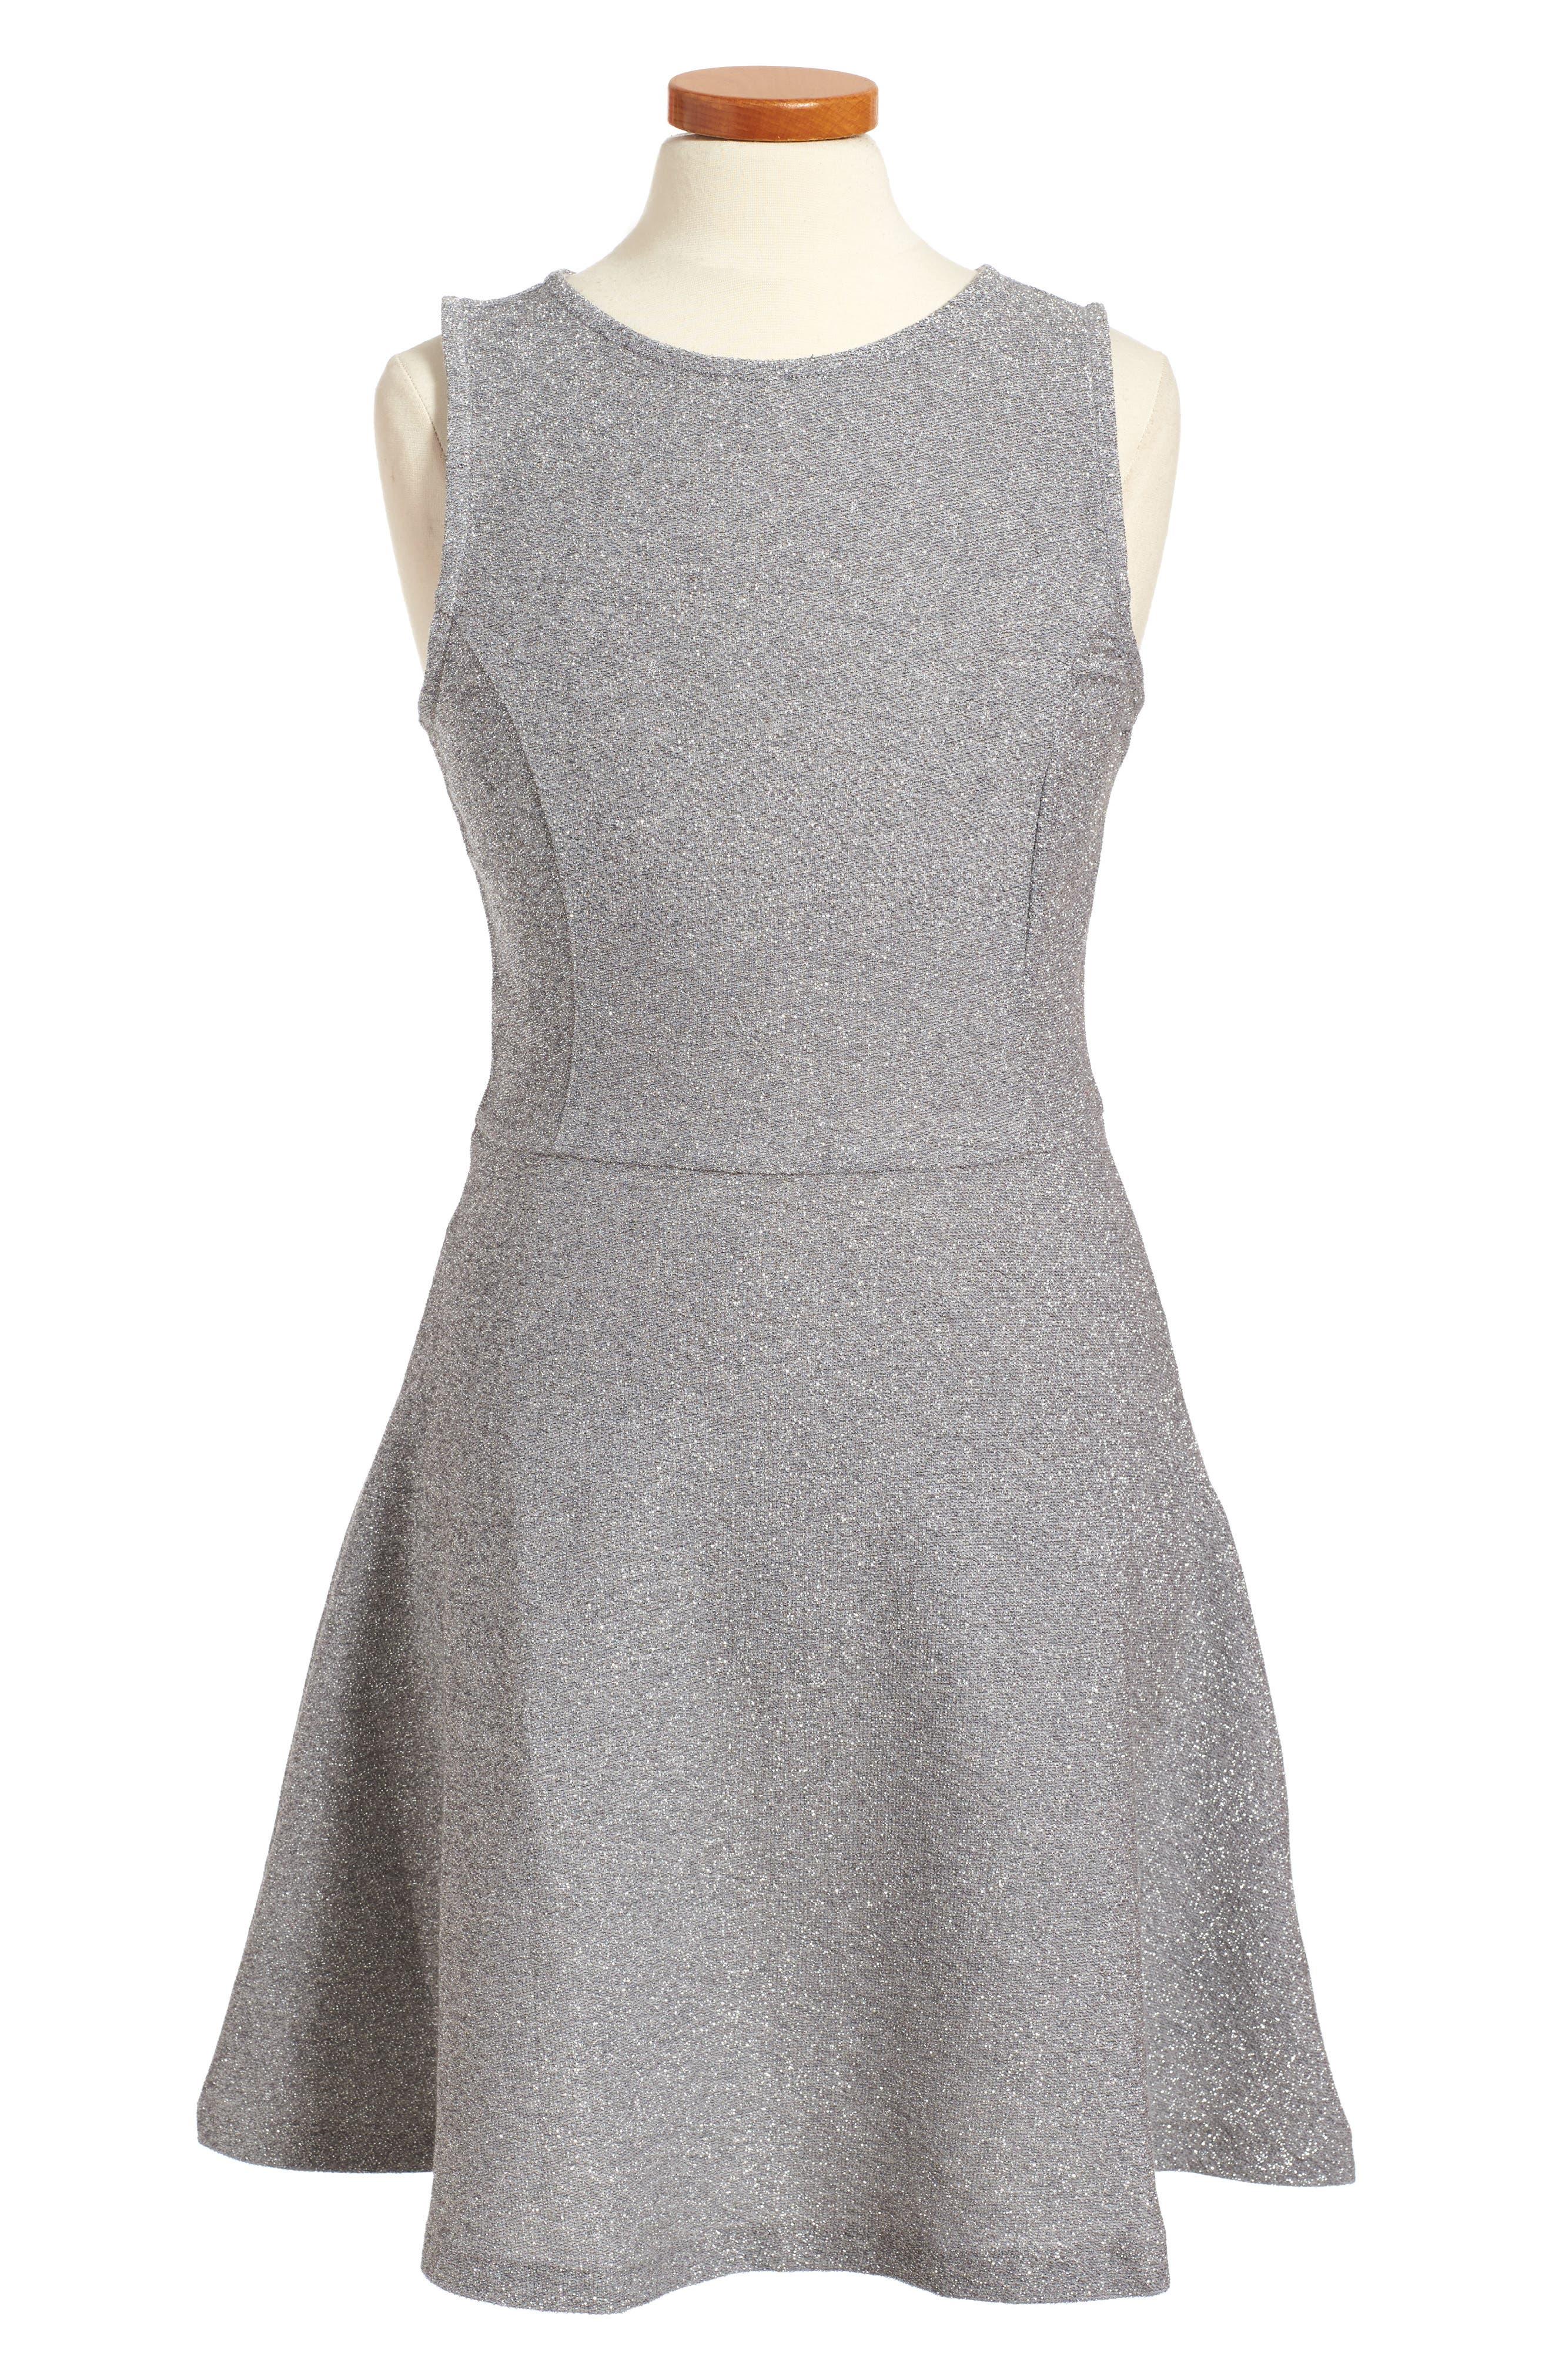 Sparkle Skater Dress,                             Main thumbnail 1, color,